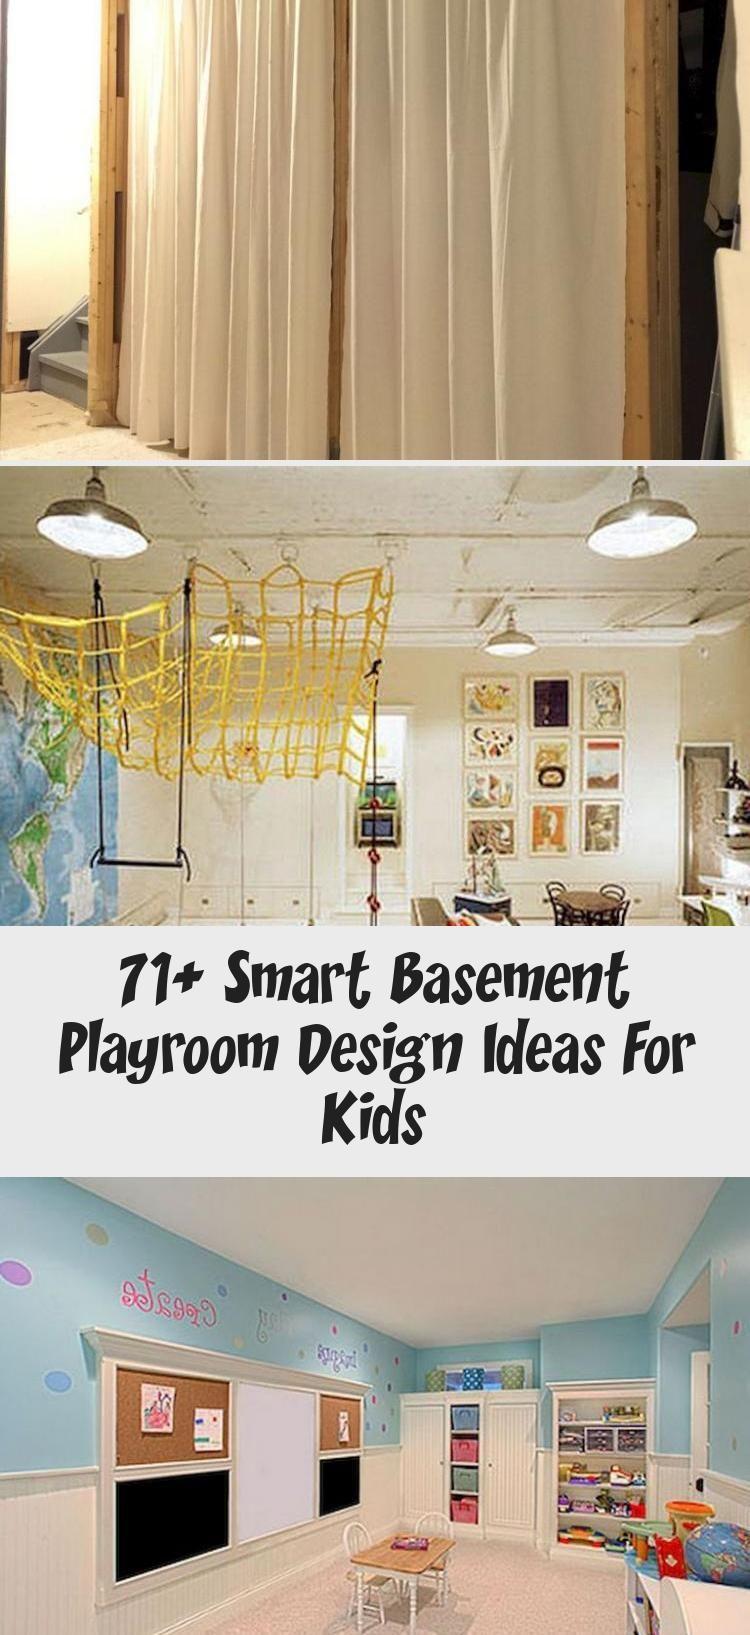 71+ Smart Basement Playroom Design Ideas For Kids - Decor Dıy  71+ Smart Basement Playroom Design Ideas for Kids #designinspiration #designhouse #designinterior # #Basement #decor #Design #DIY #Ideas #Kids #Playroom #Smart